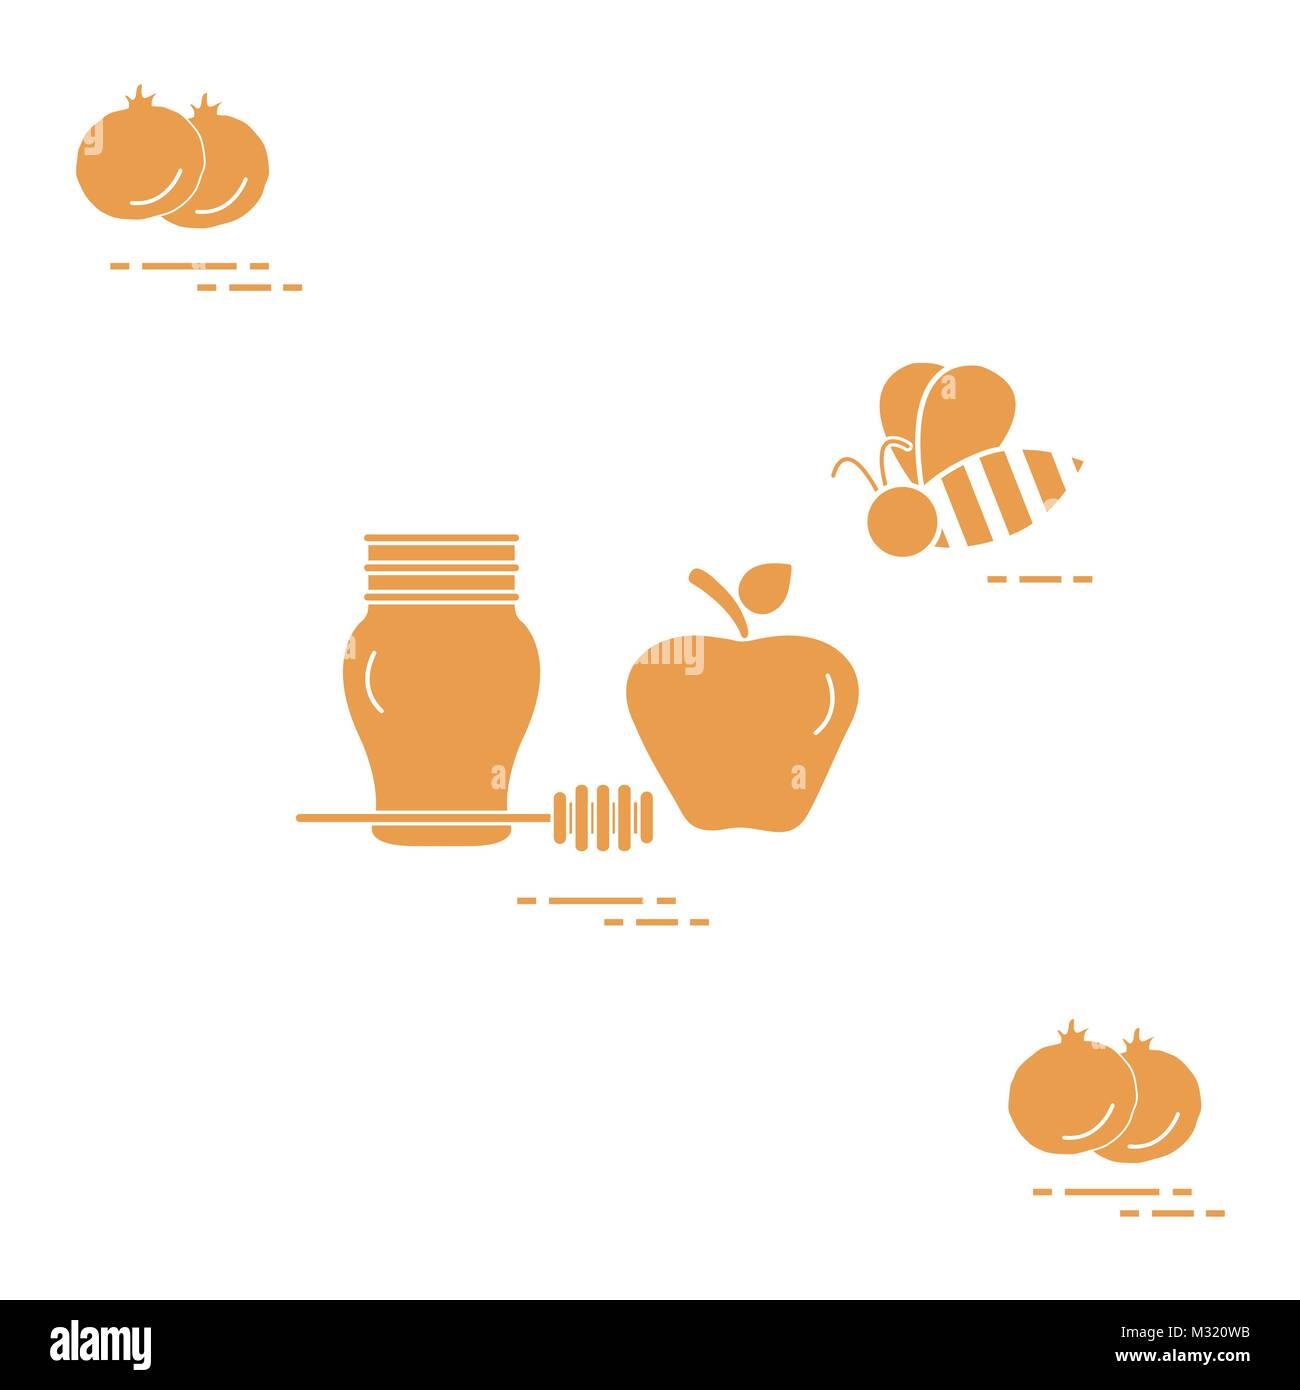 Apple in honey in rosh hashanah pomegranate bee traditional apple in honey in rosh hashanah pomegranate bee traditional jewish food and symbols biocorpaavc